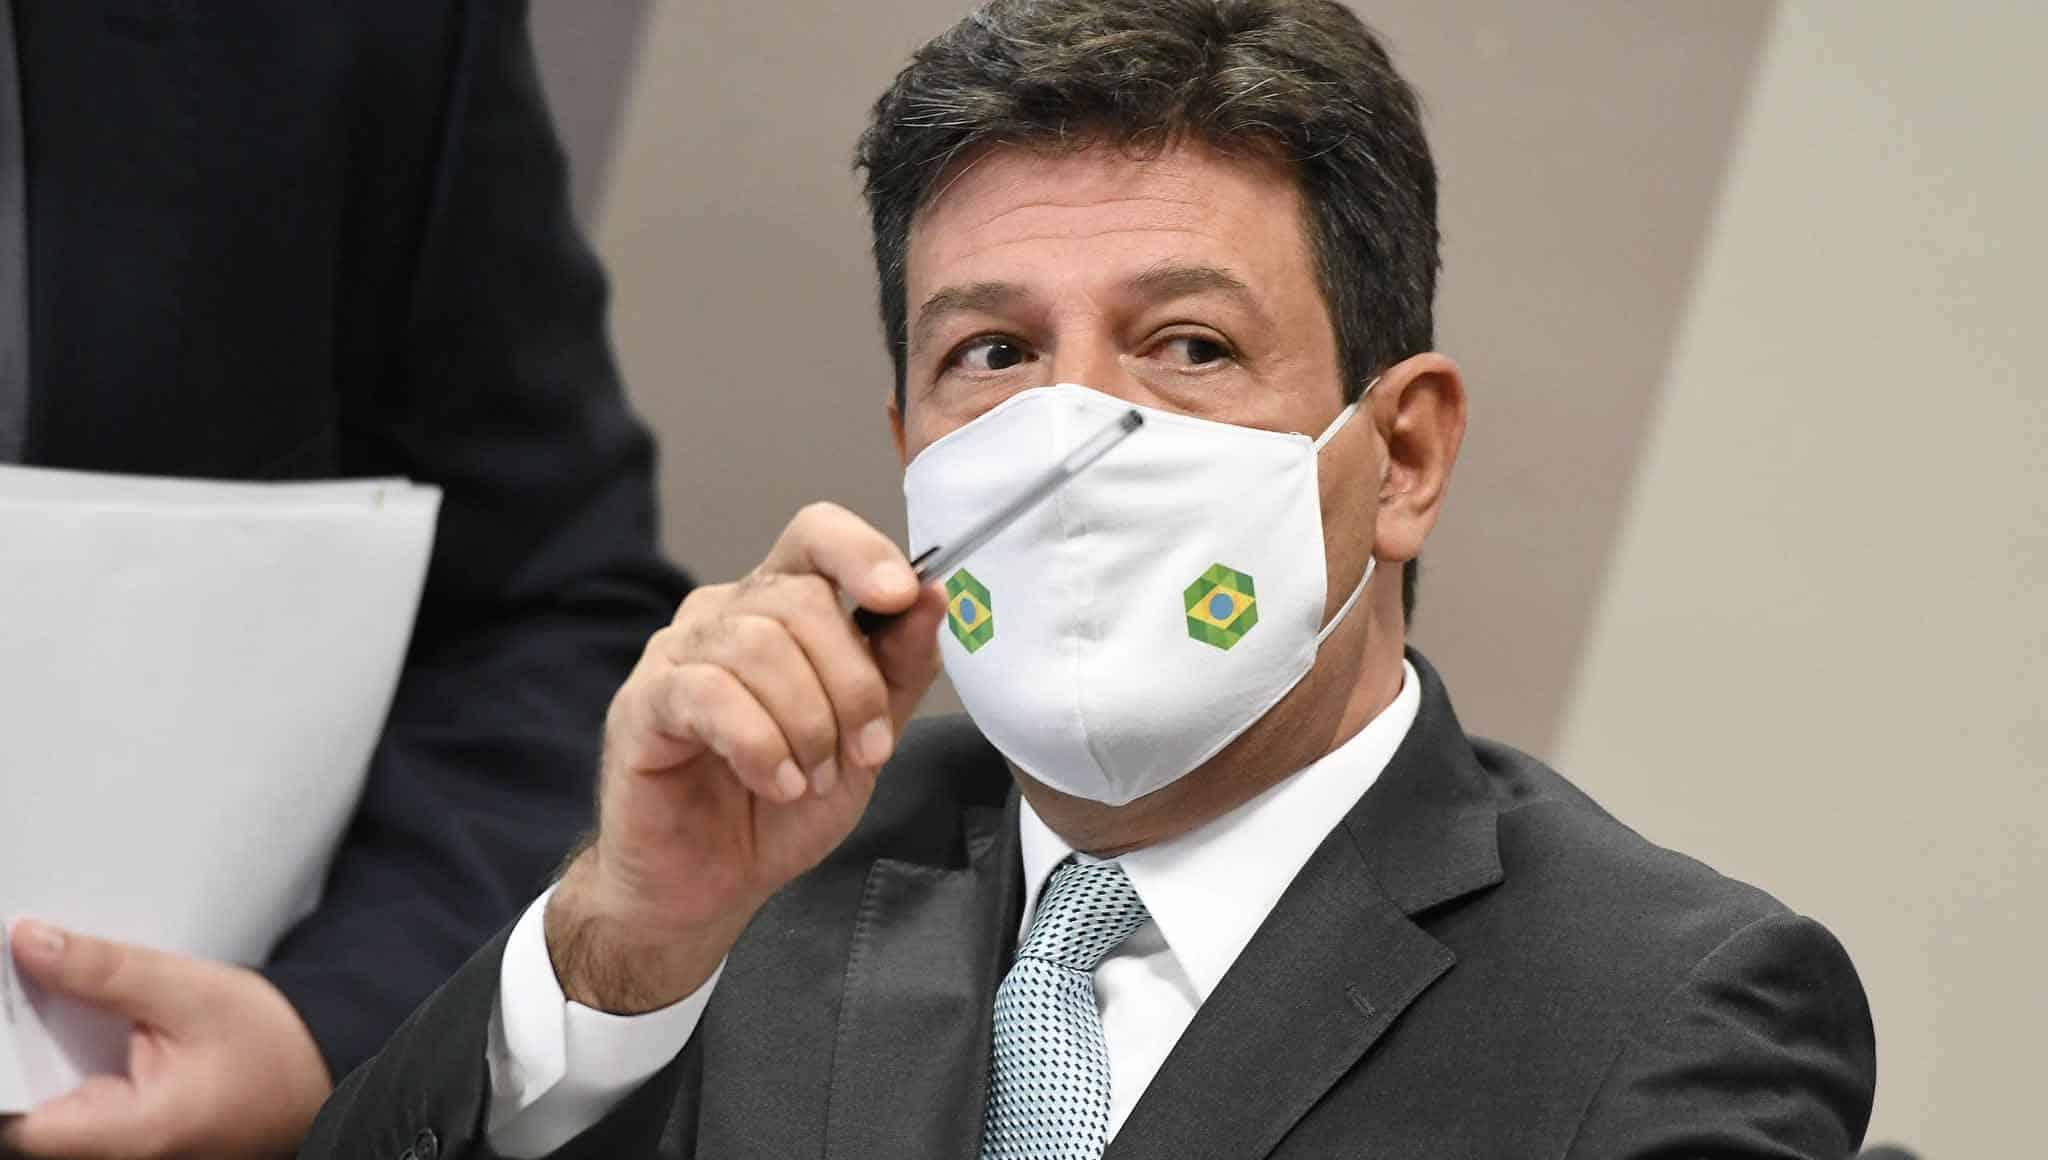 Mandetta entrega 'carta-bomba' à CPI da Covid: 'Bolsonaro duvidou de projeções de mortes'